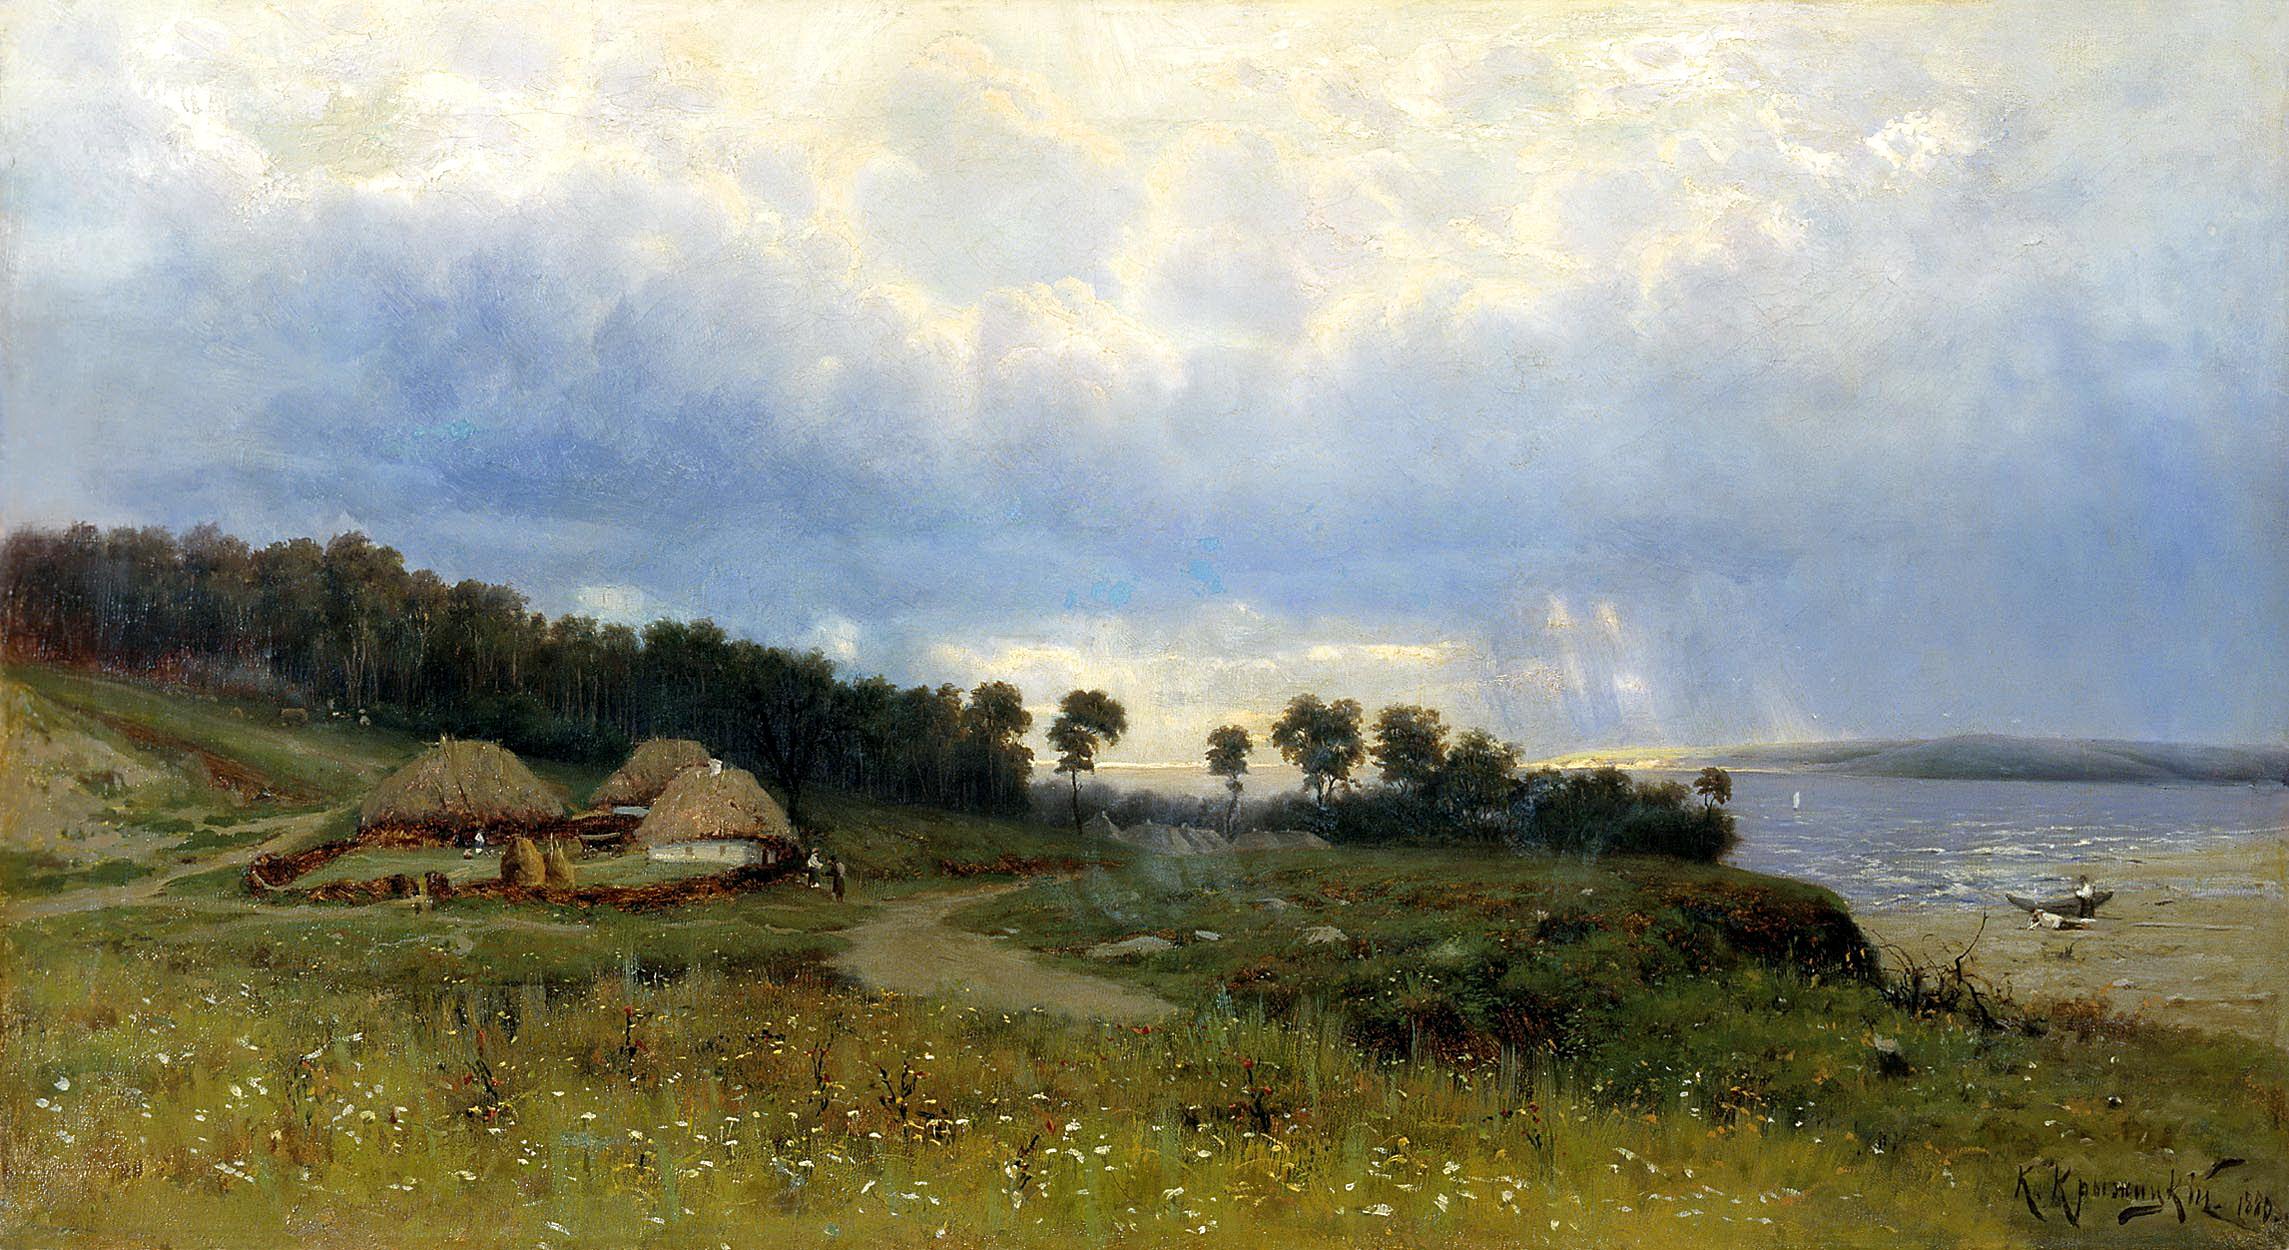 1385139500-kryzhickiiy-konstantin---pered-dozhdiem-before-the-rain